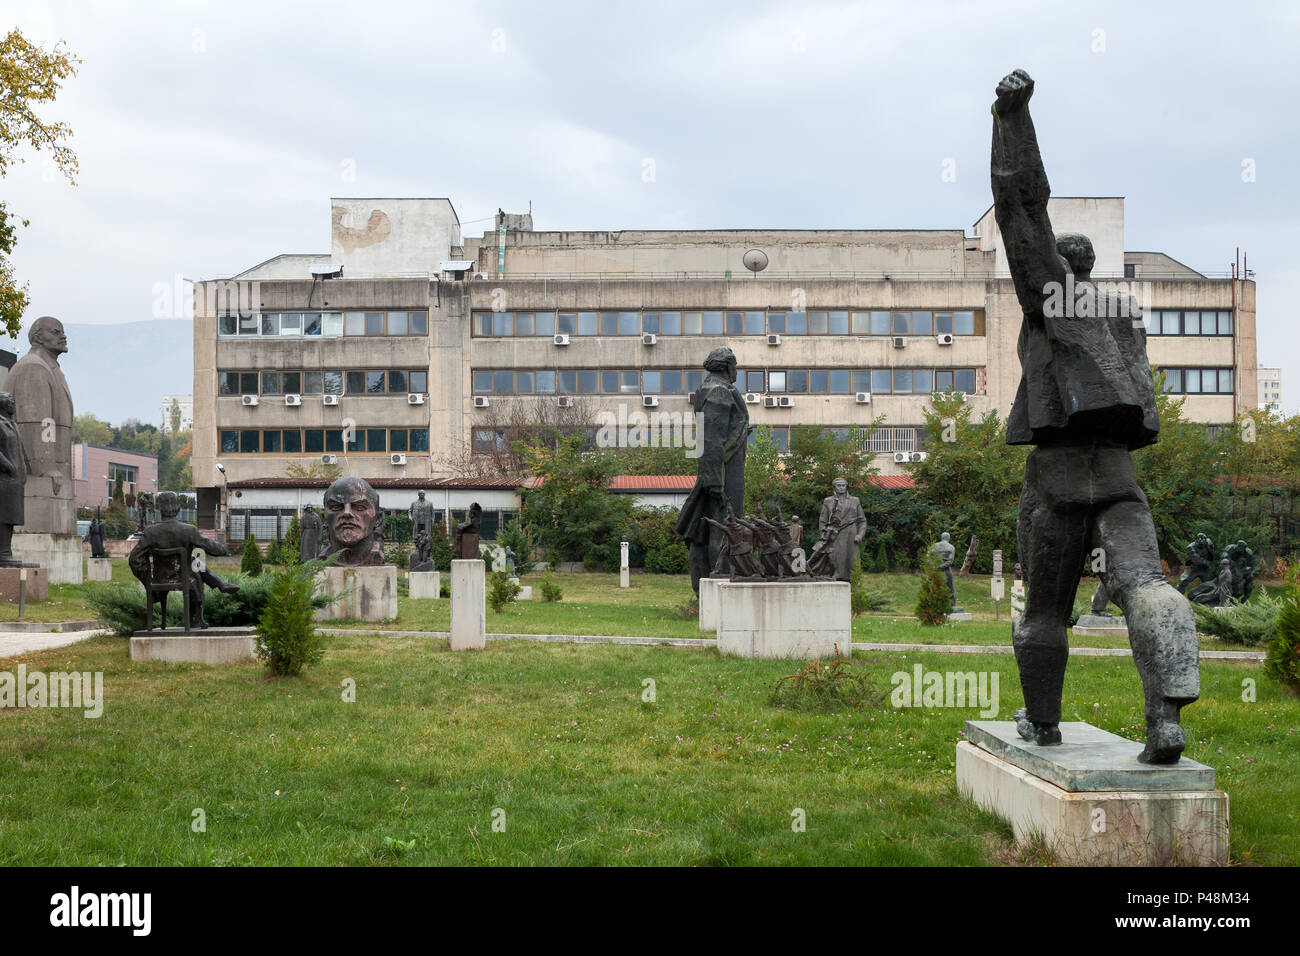 Sofia, Bulgaria, exhibition site for socialist monuments - Stock Image